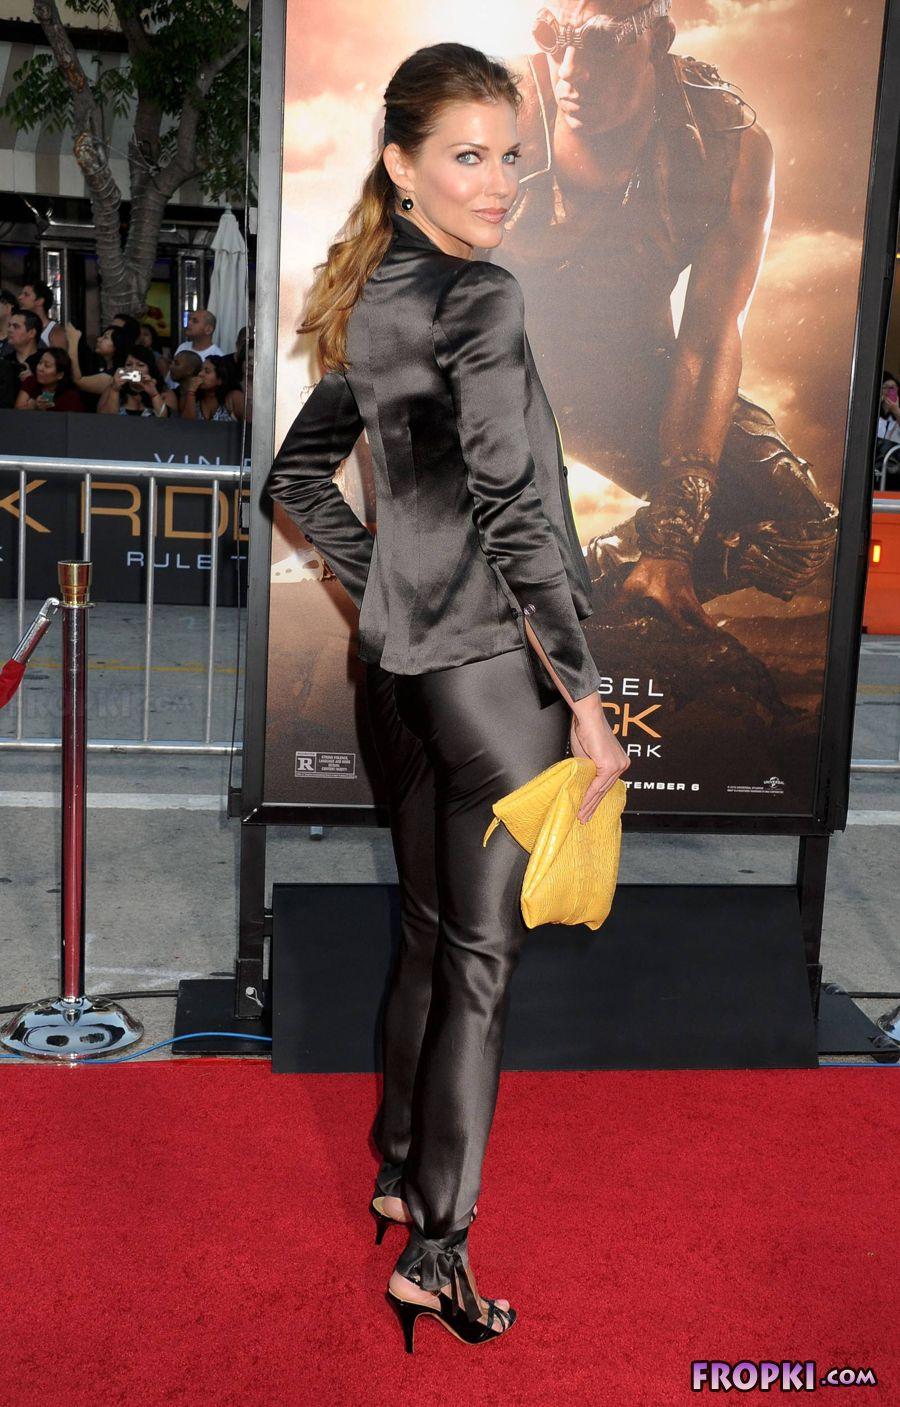 Tricia Helfer - Riddick Premiere in Los Angeles Acrw0XZx